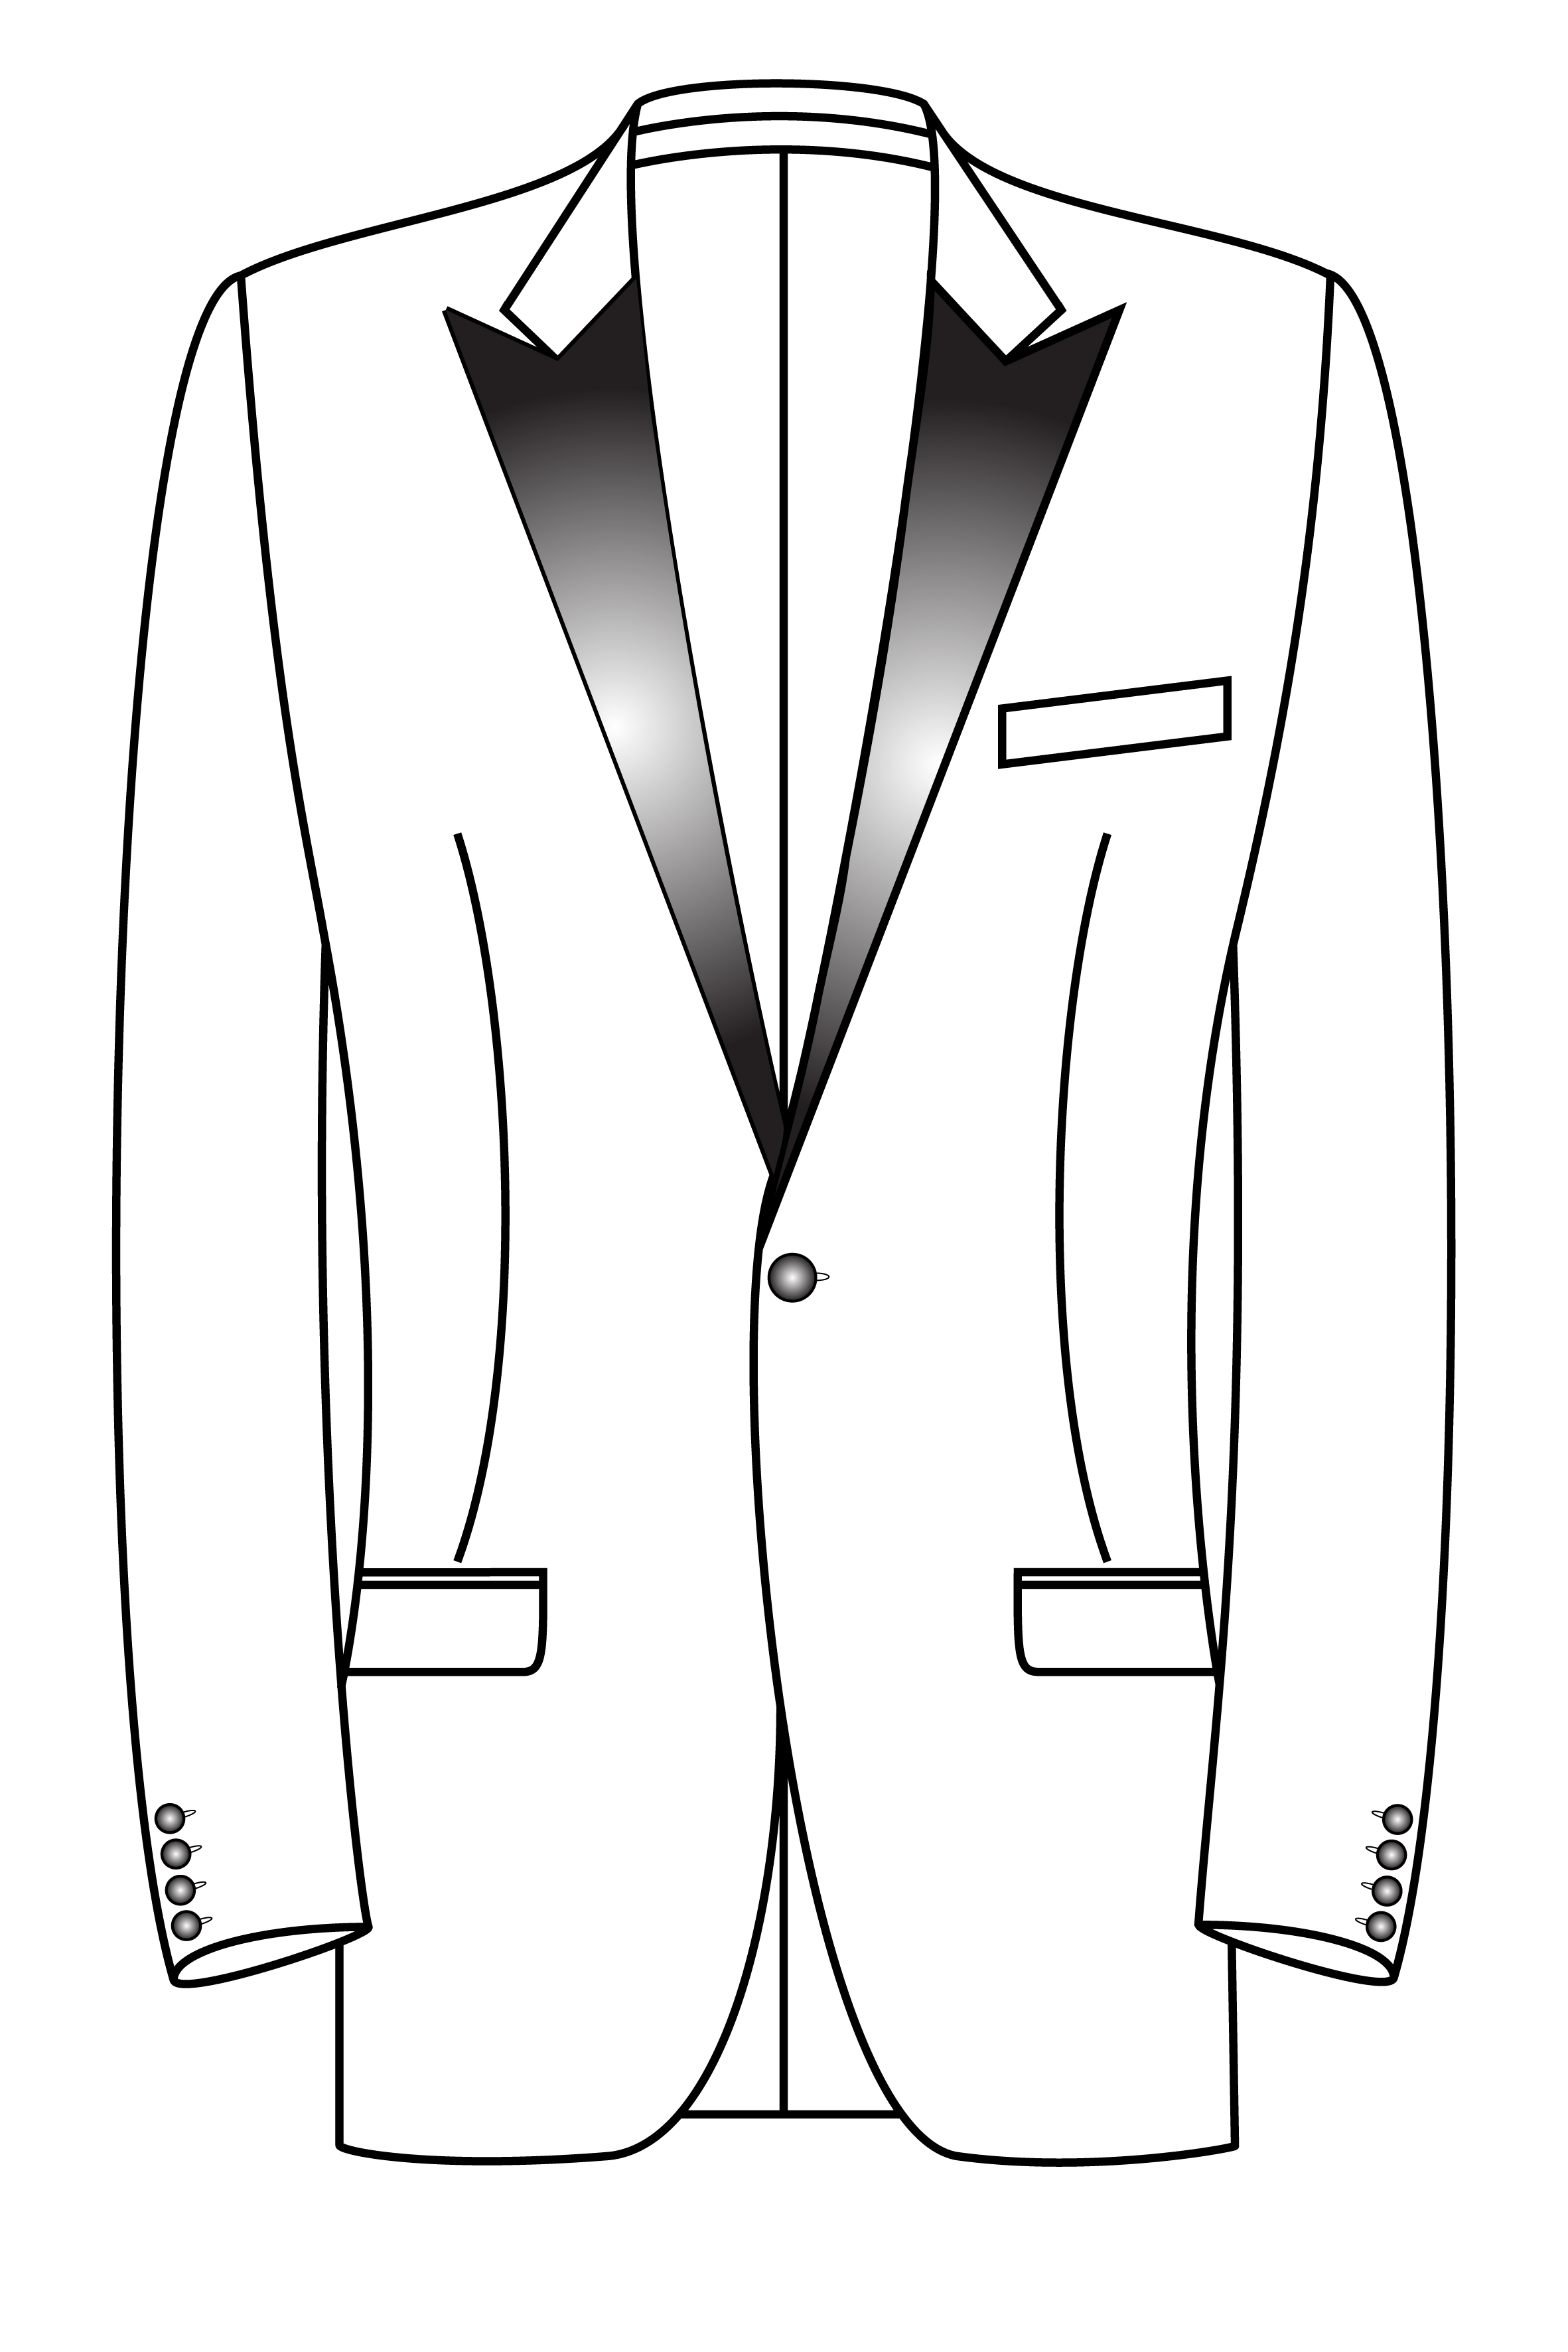 1 button peak lapel straight pockets smoking tuxedo dinner jacket.png